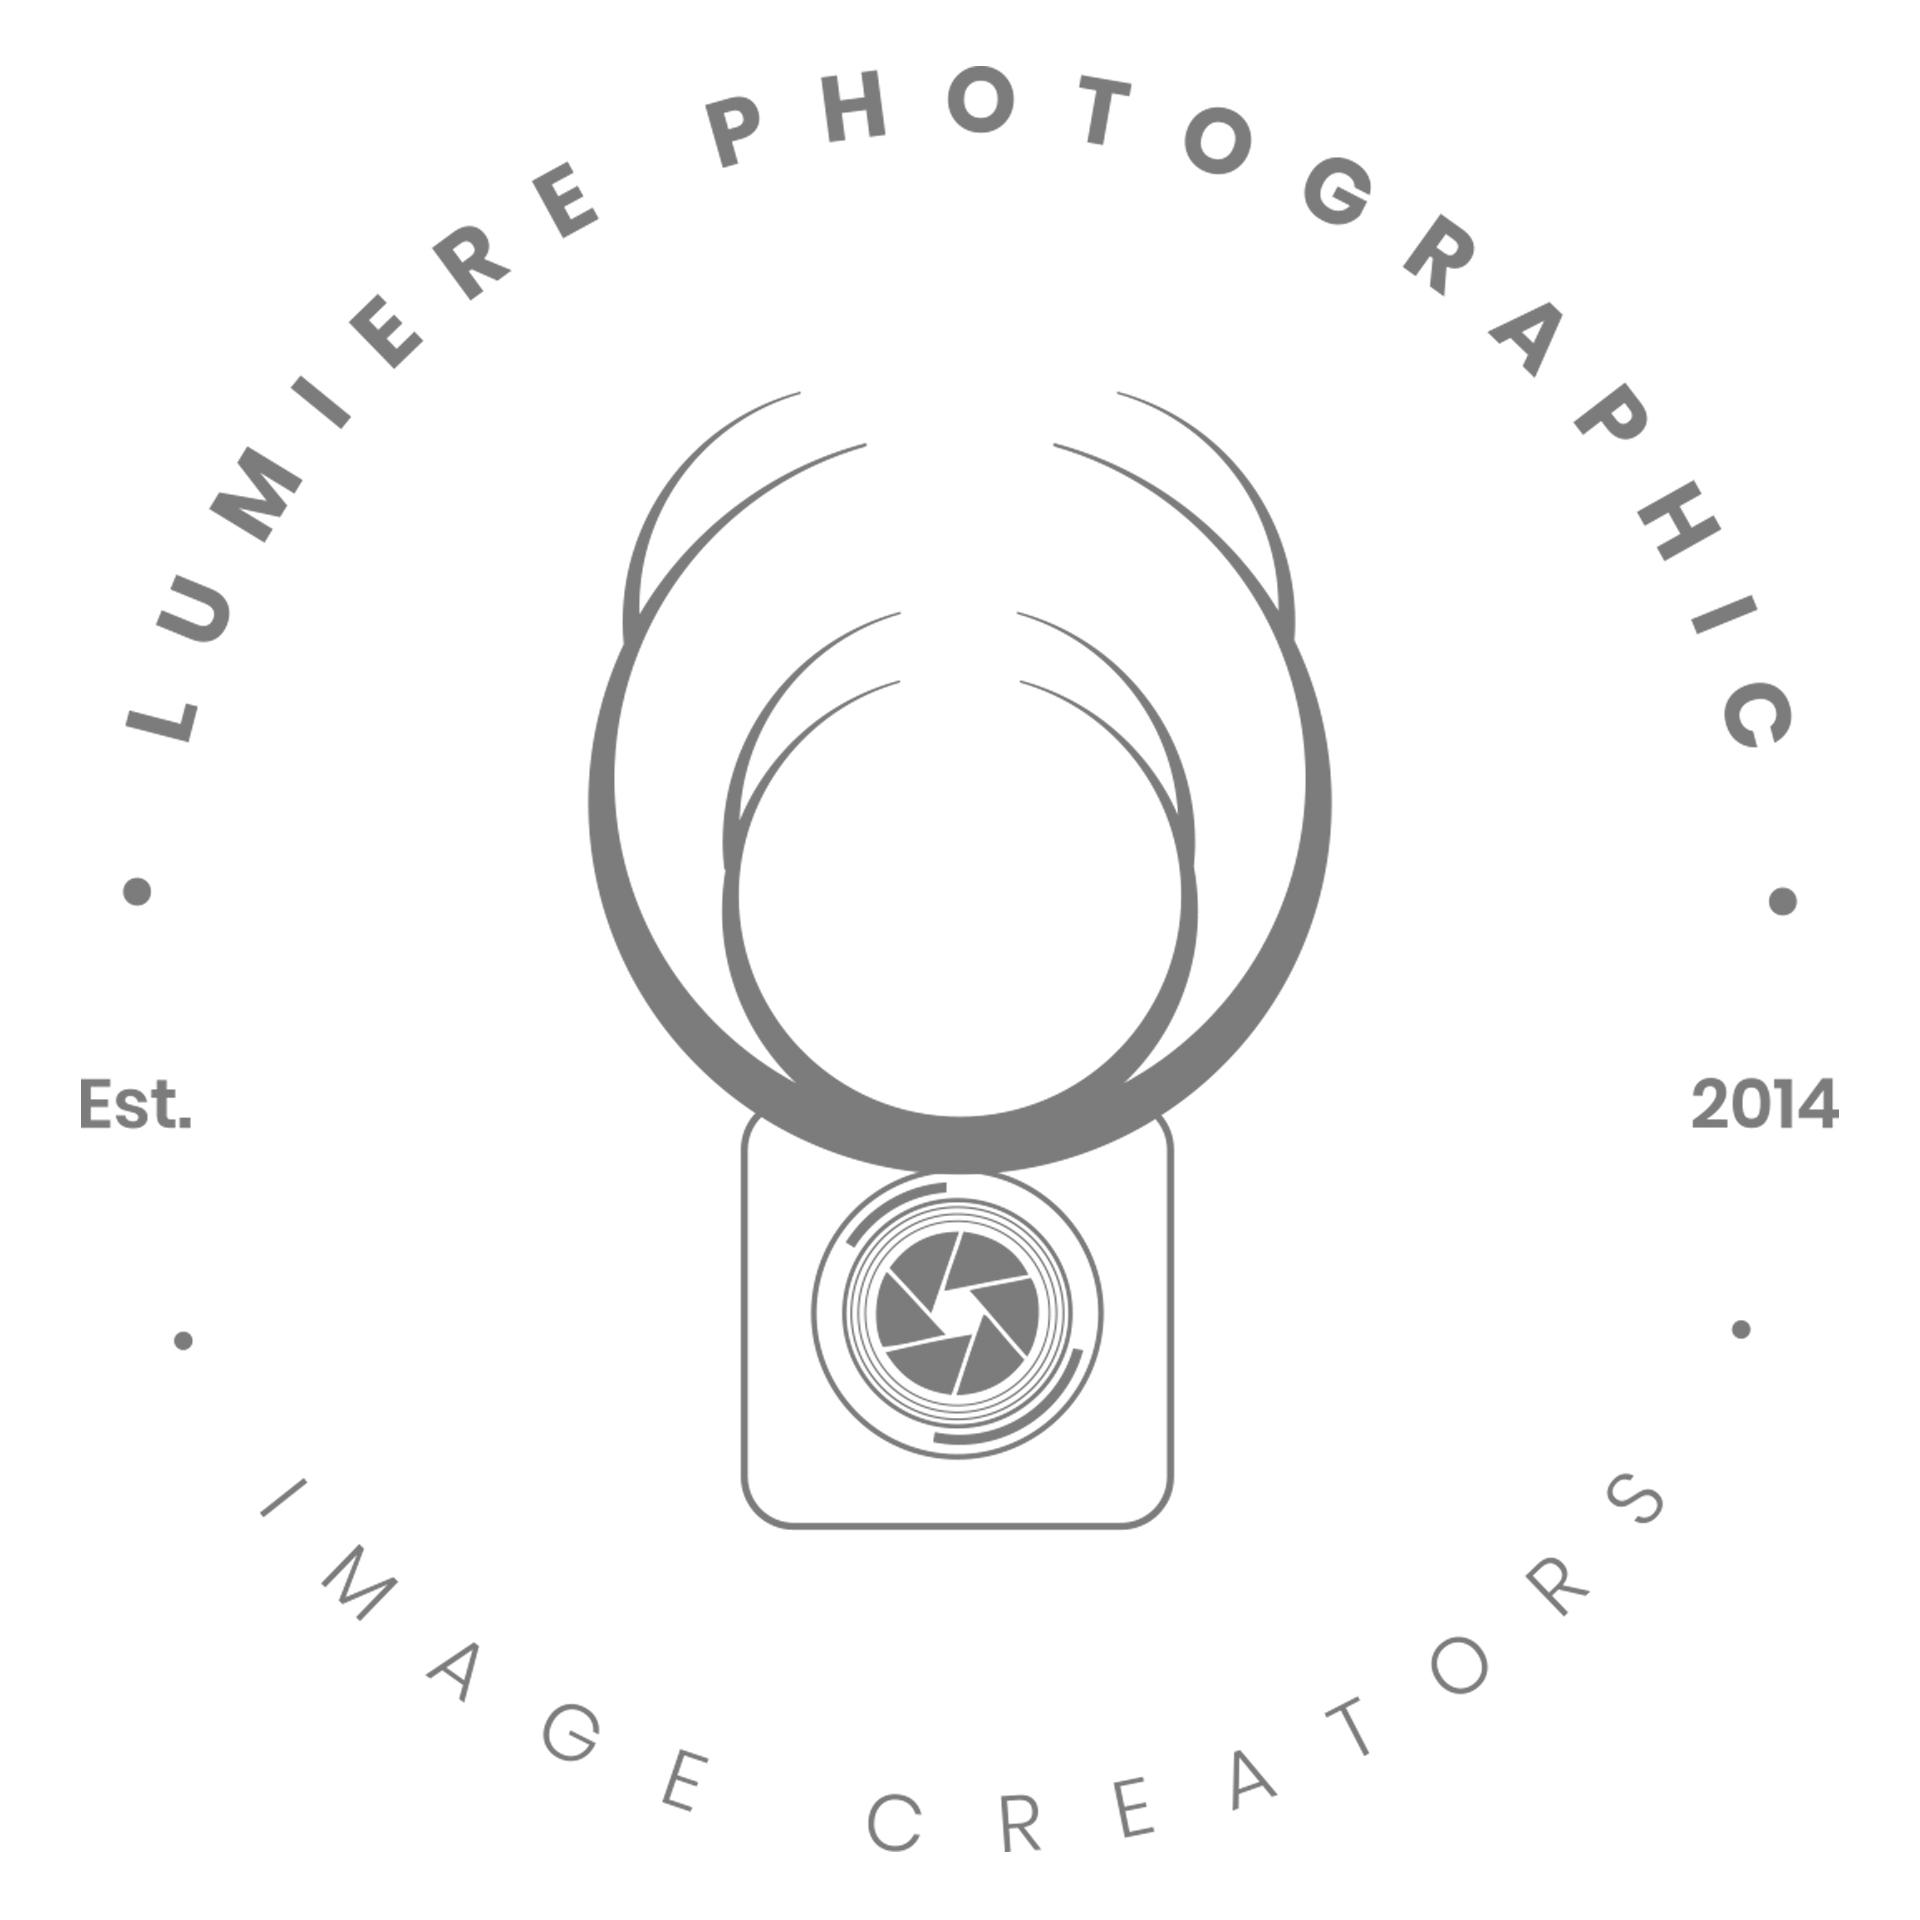 lumiere photographic